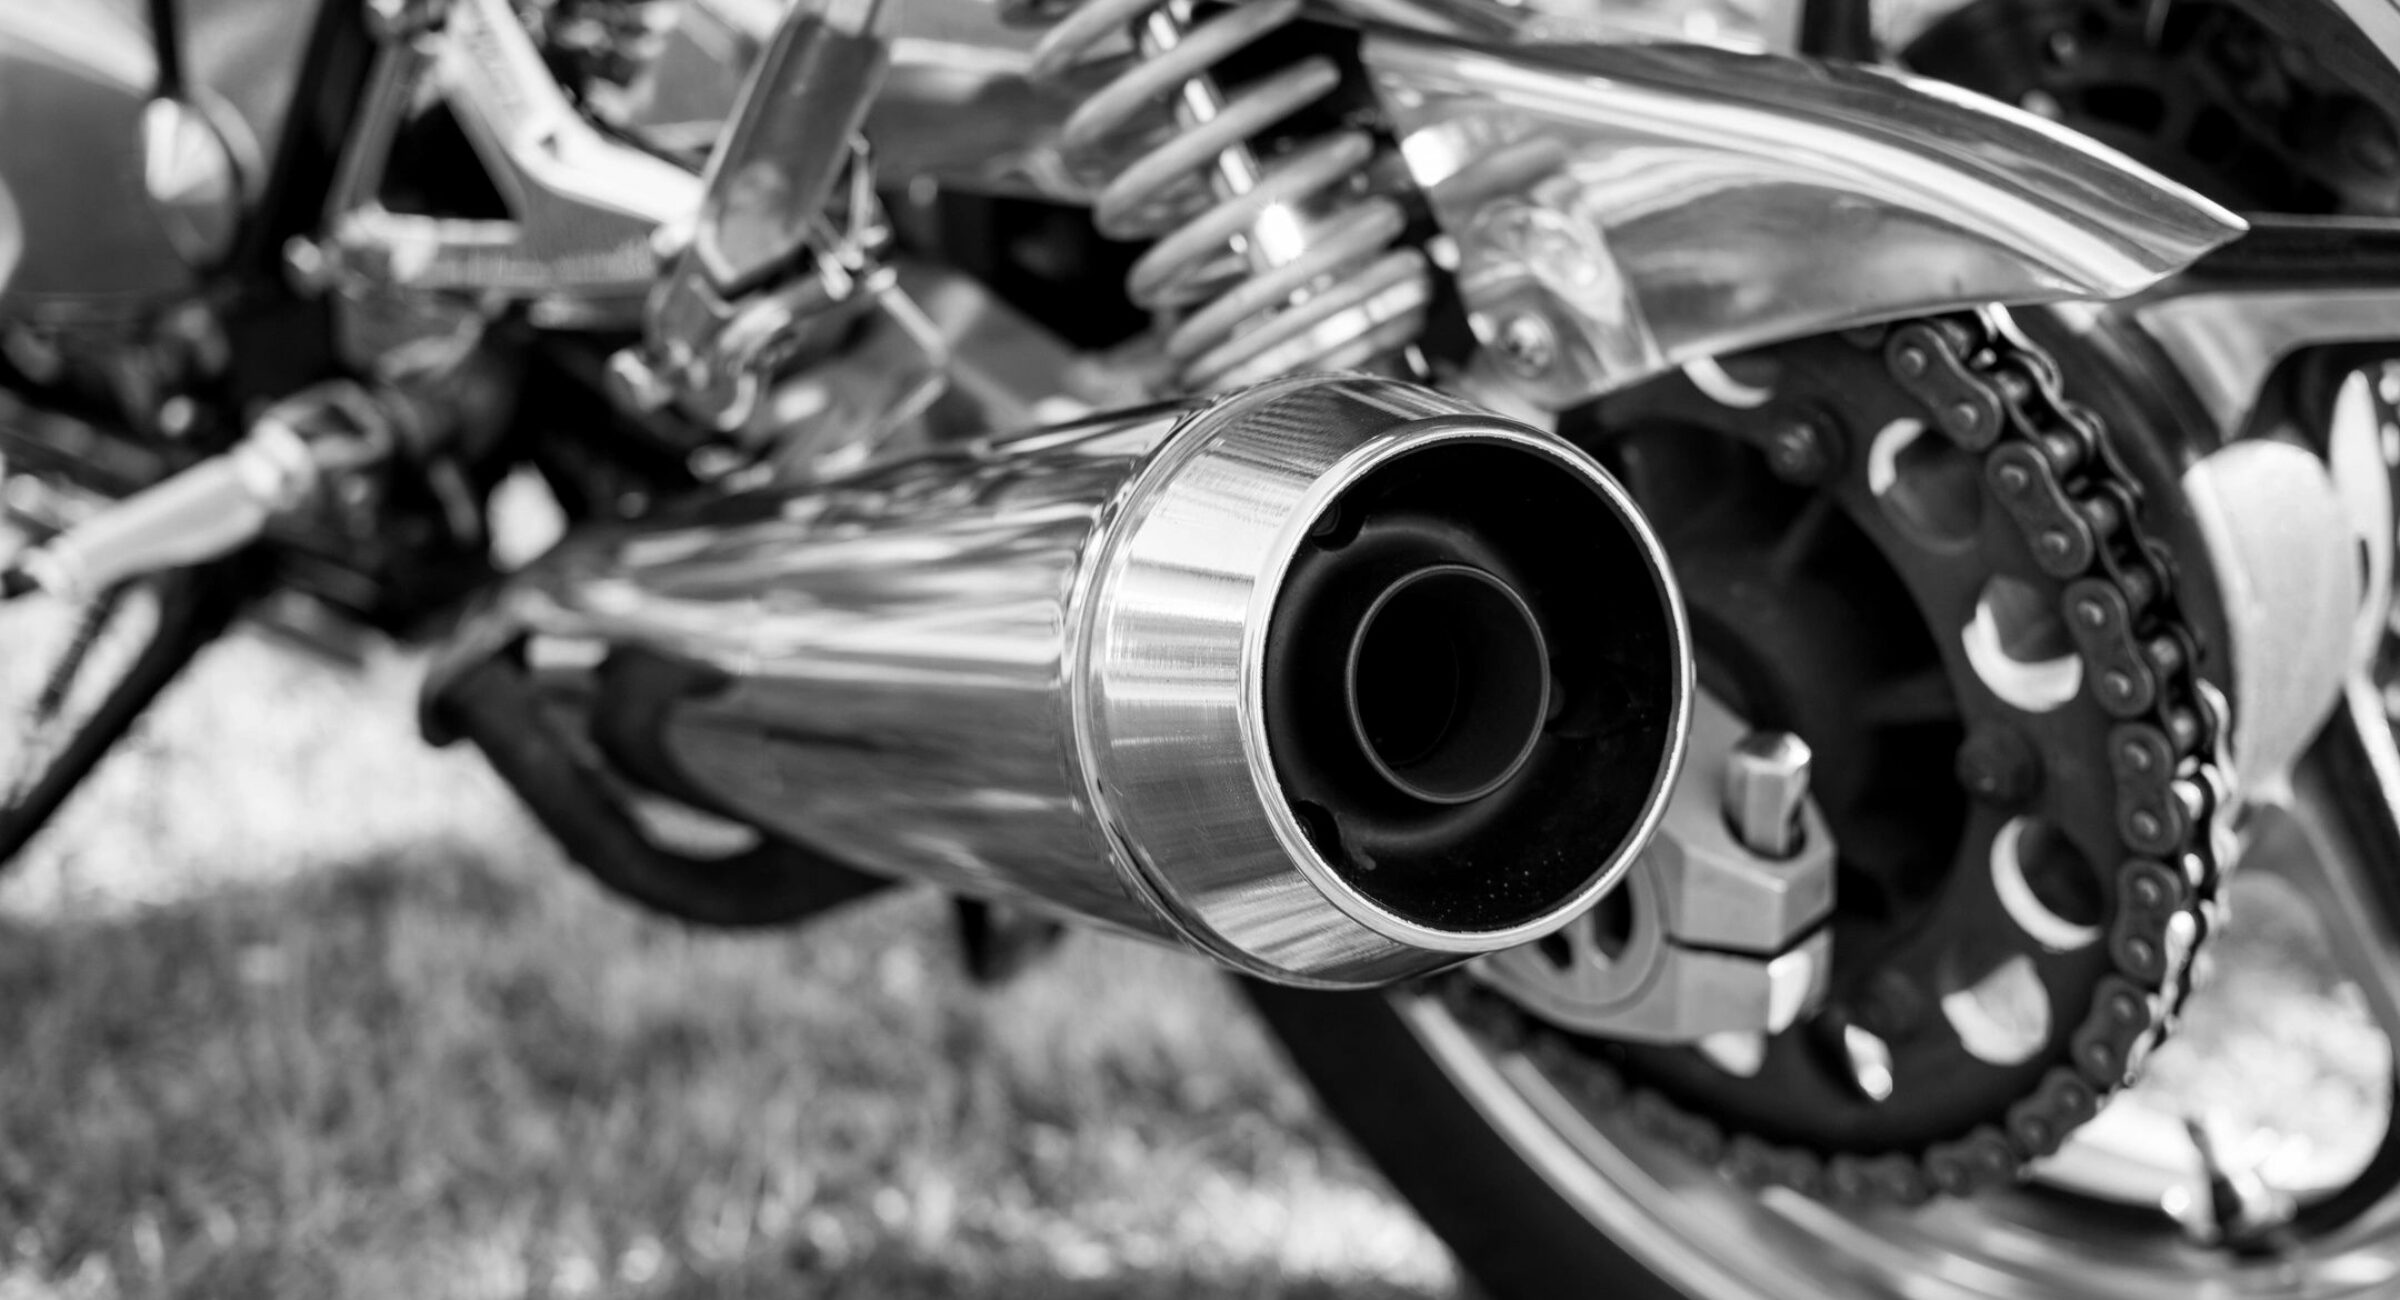 Salt Lake Motorcycle Club